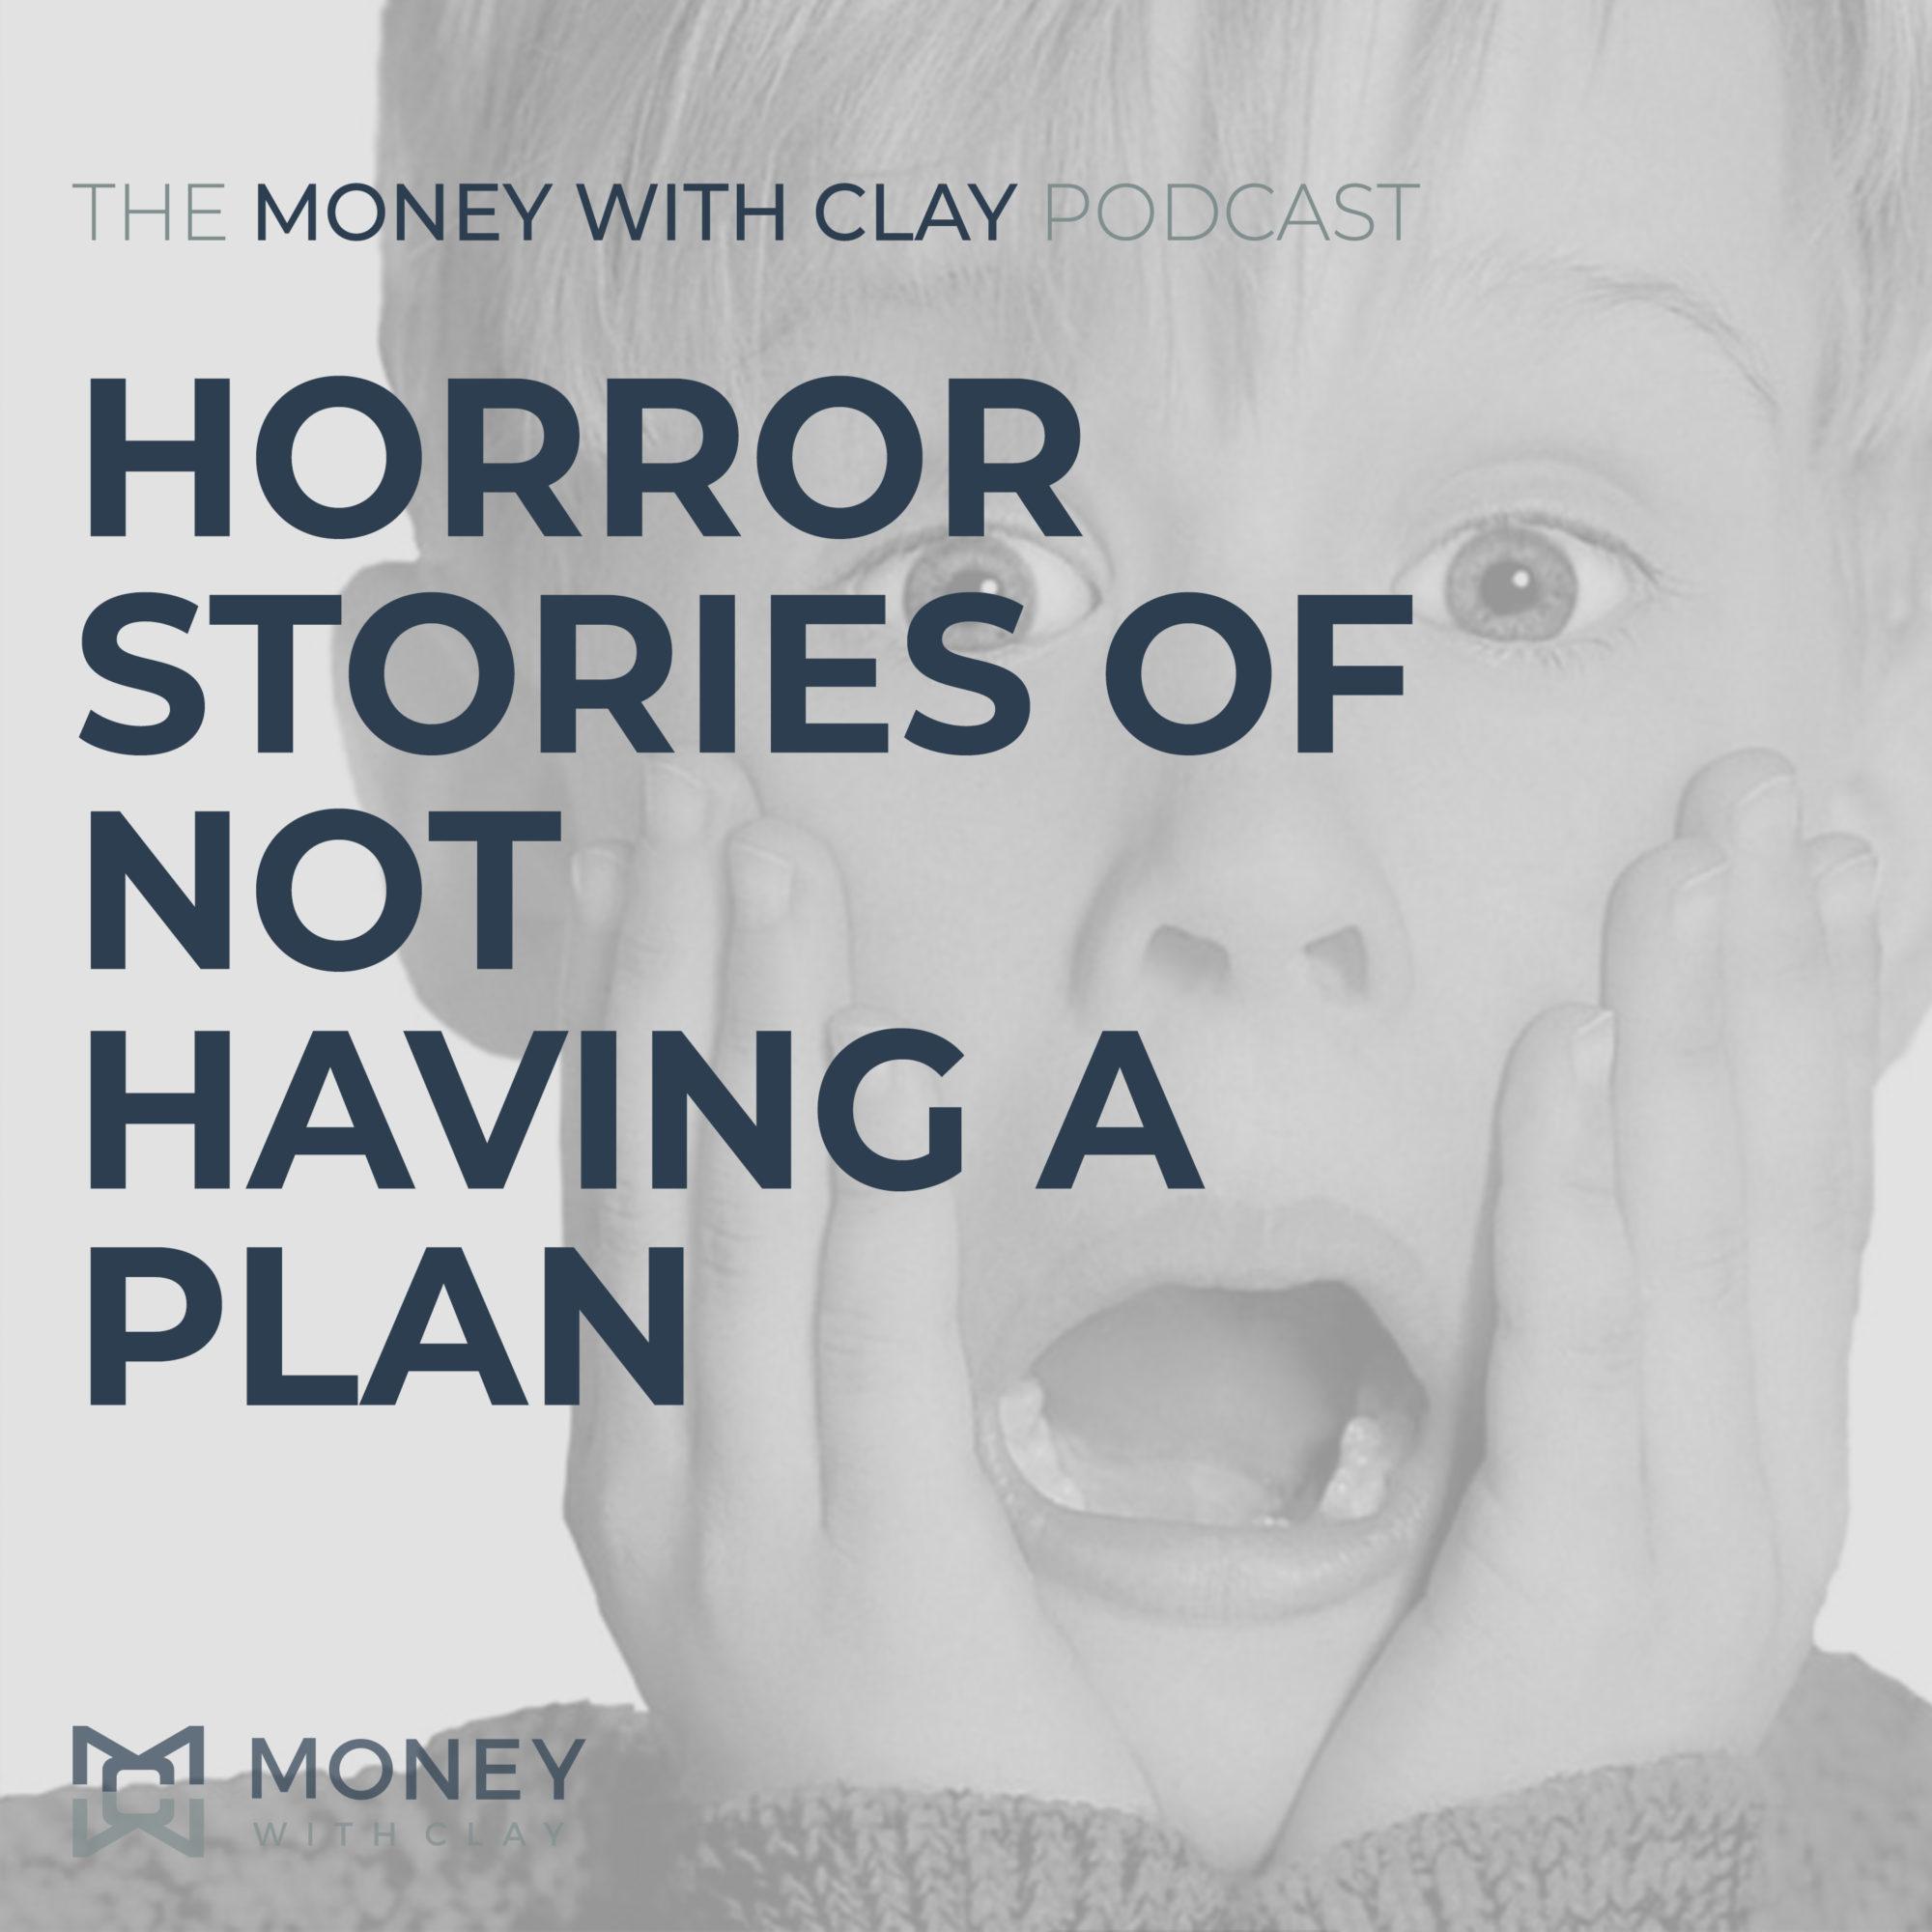 Horror Stories of Not Having a Plan